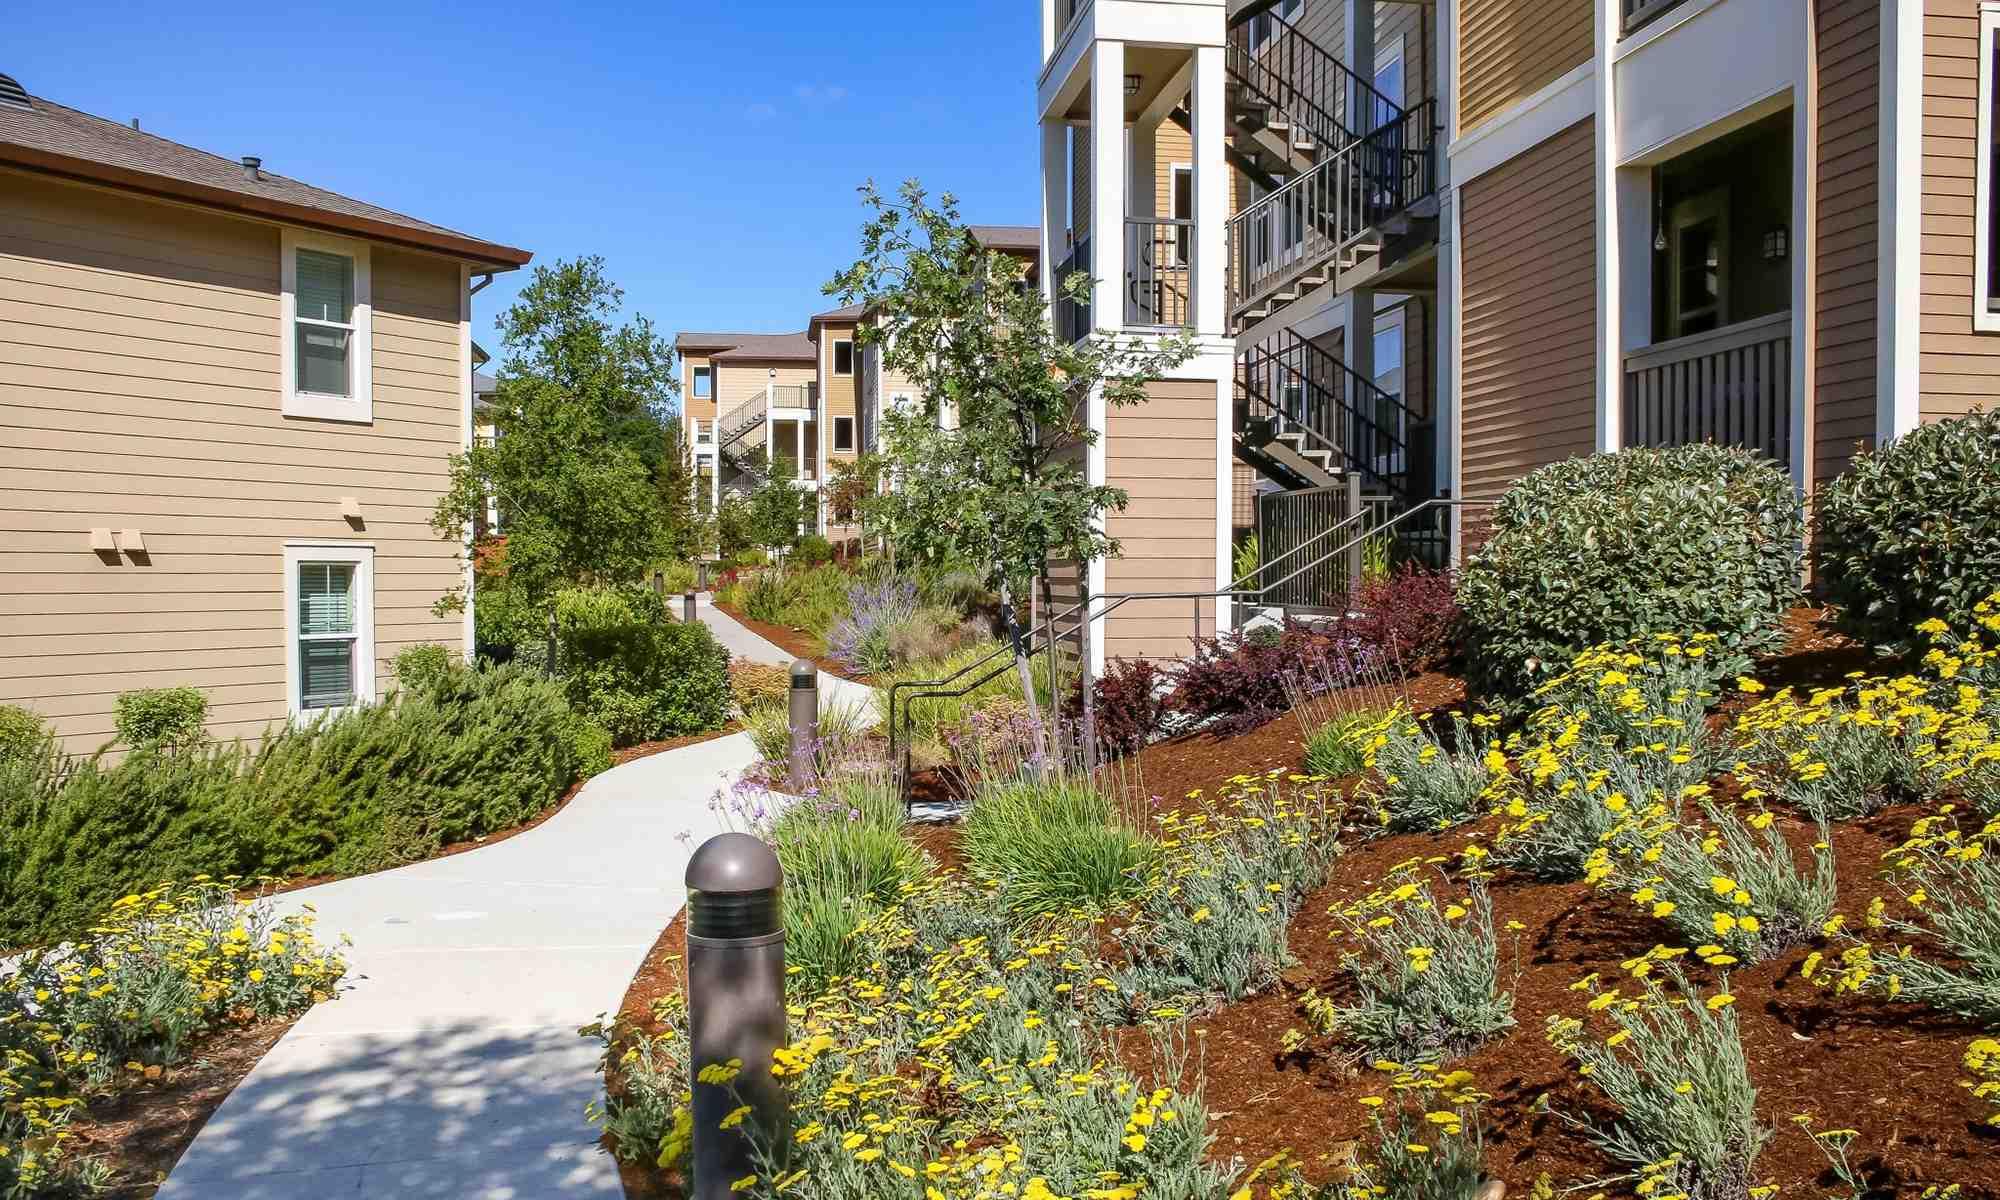 Well Landscaped Yards at the Santa Rosa Apartments